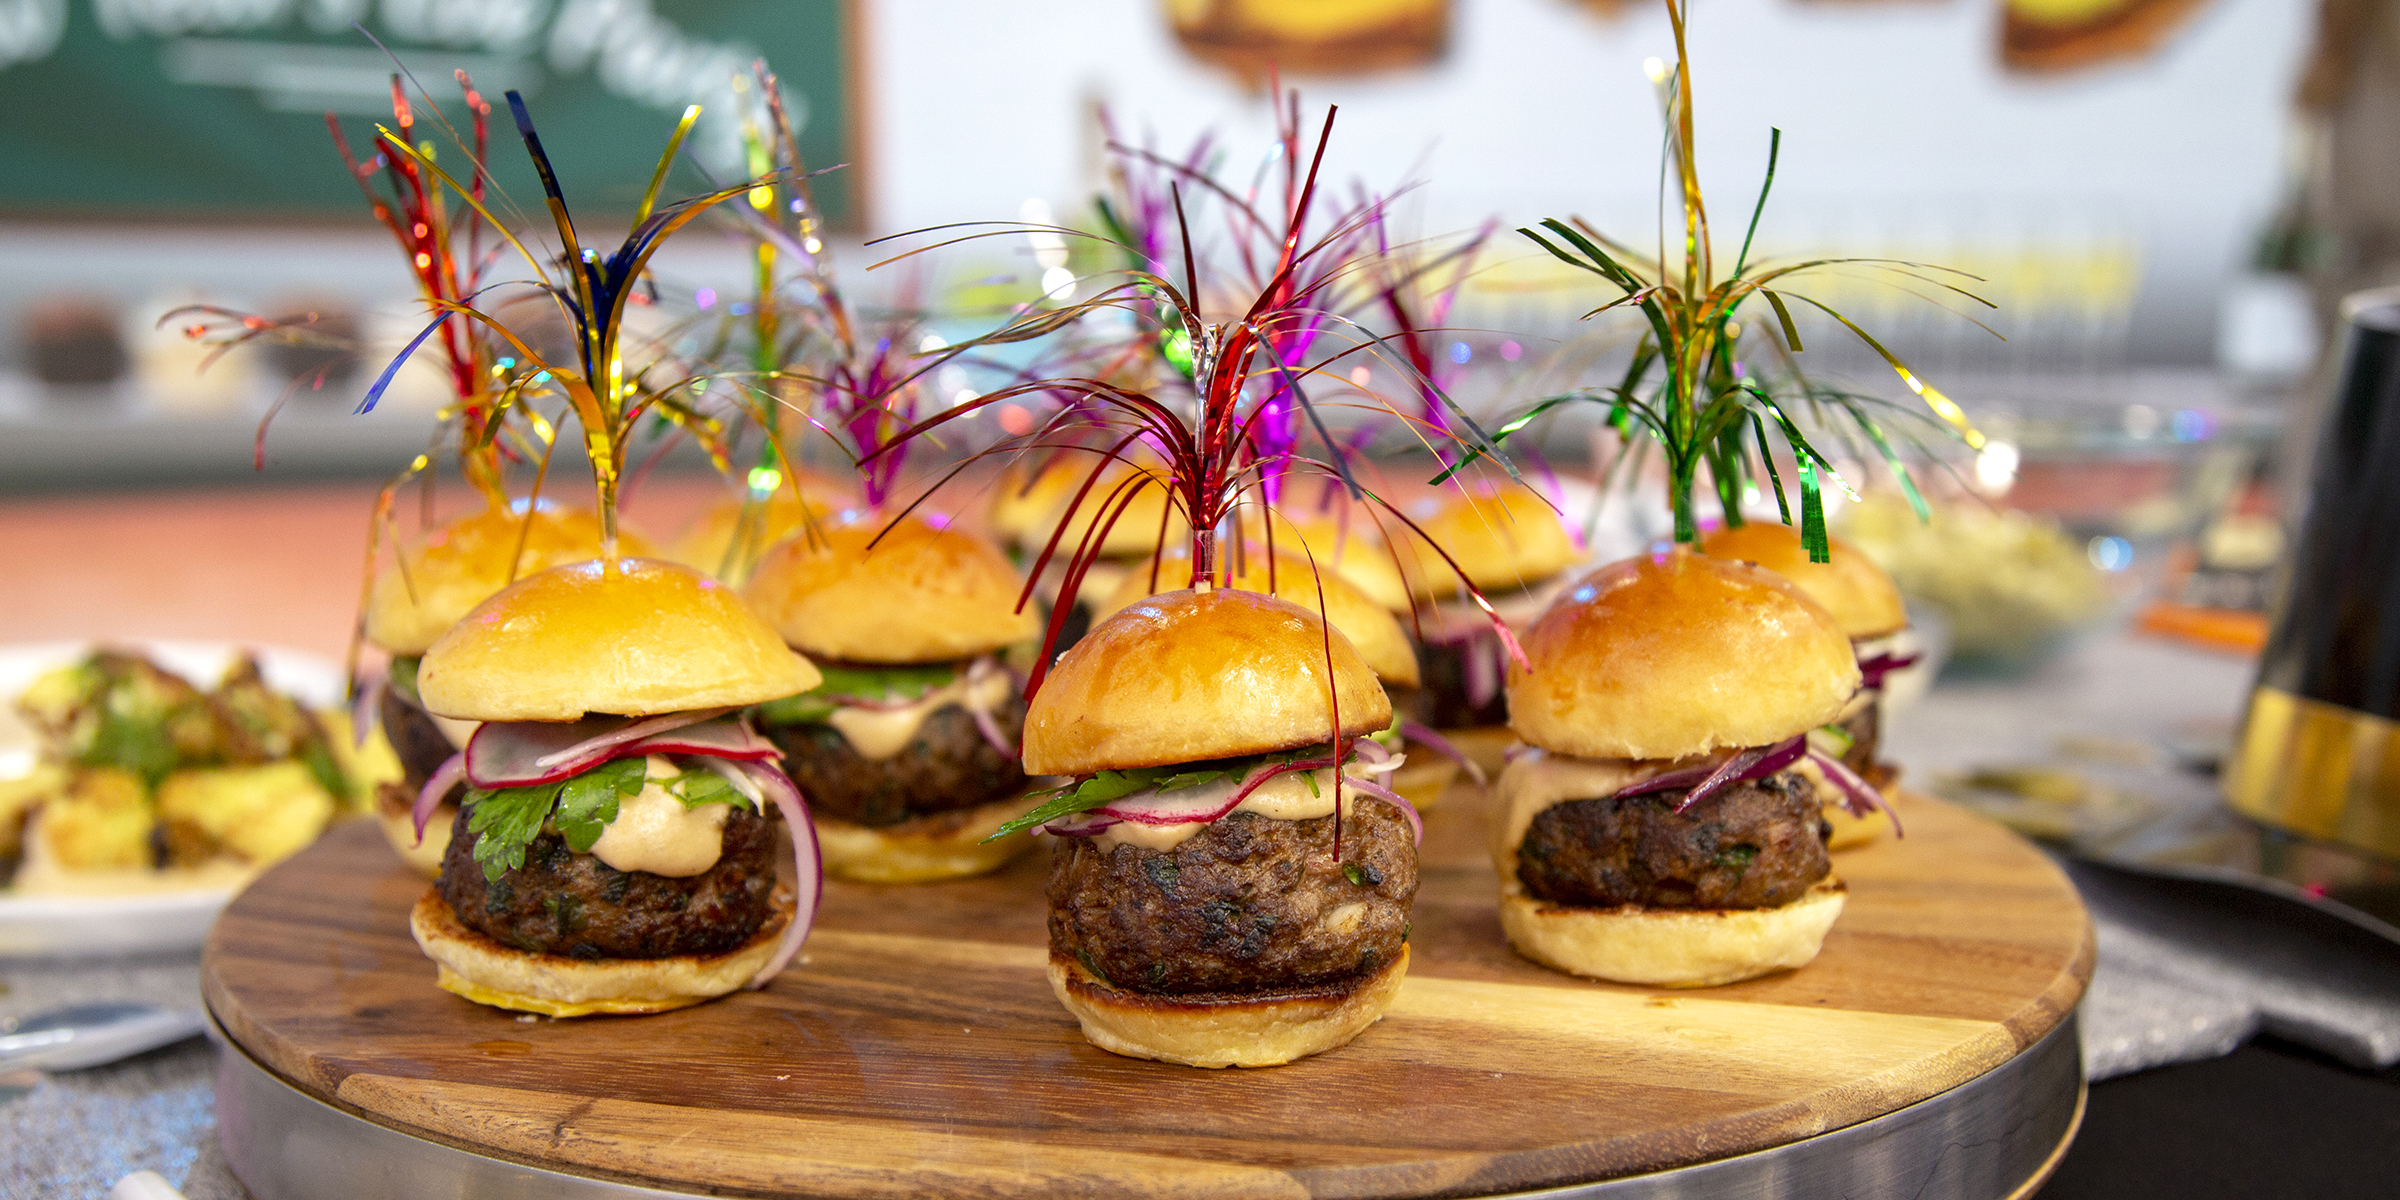 mini-lamb-burgers-today-main-181231_afa8e1342356f39262c2d1a21cd017f5.jpg